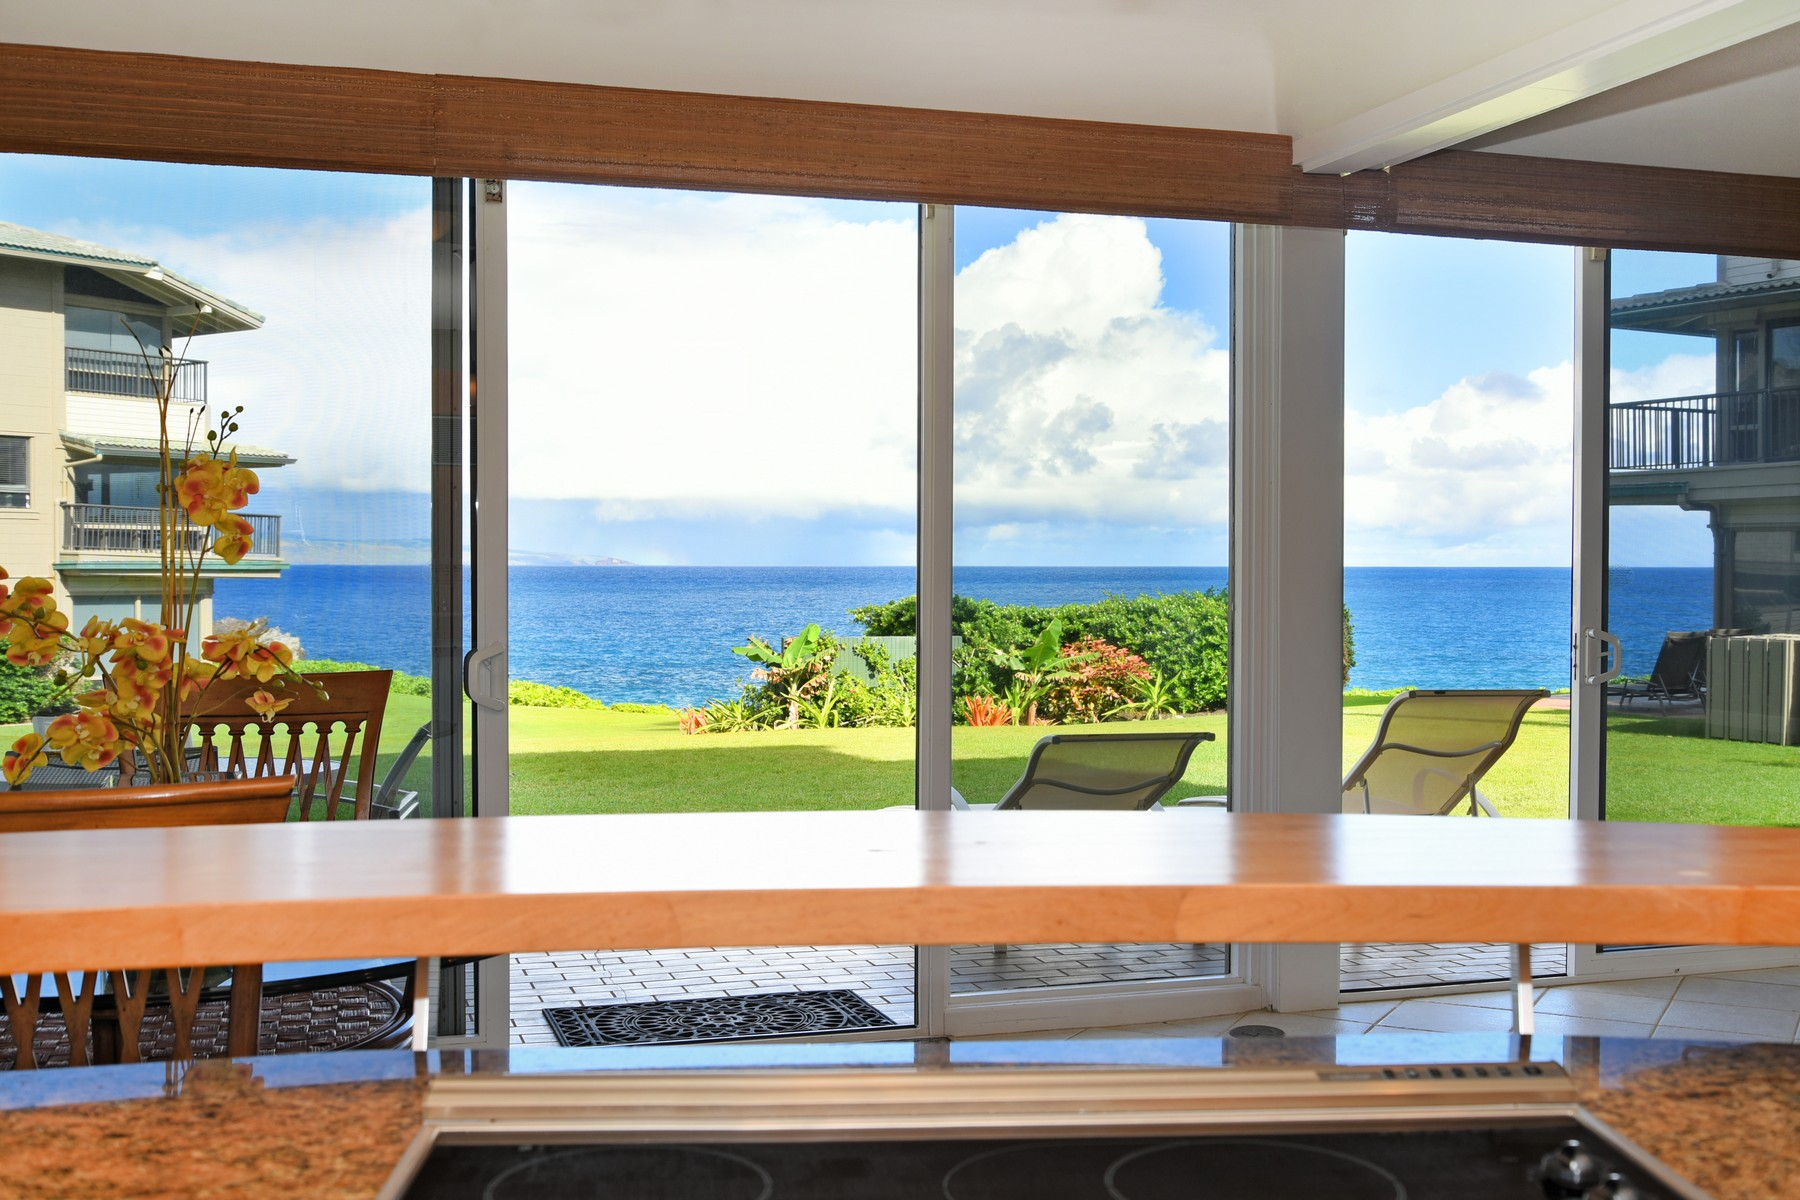 Condominium for Sale at Kapalua Bay Villas 28G1, 2 500 Bay Drive Kapalua Bay Villas 28G1, 2 Kapalua, Hawaii, 96761 United States